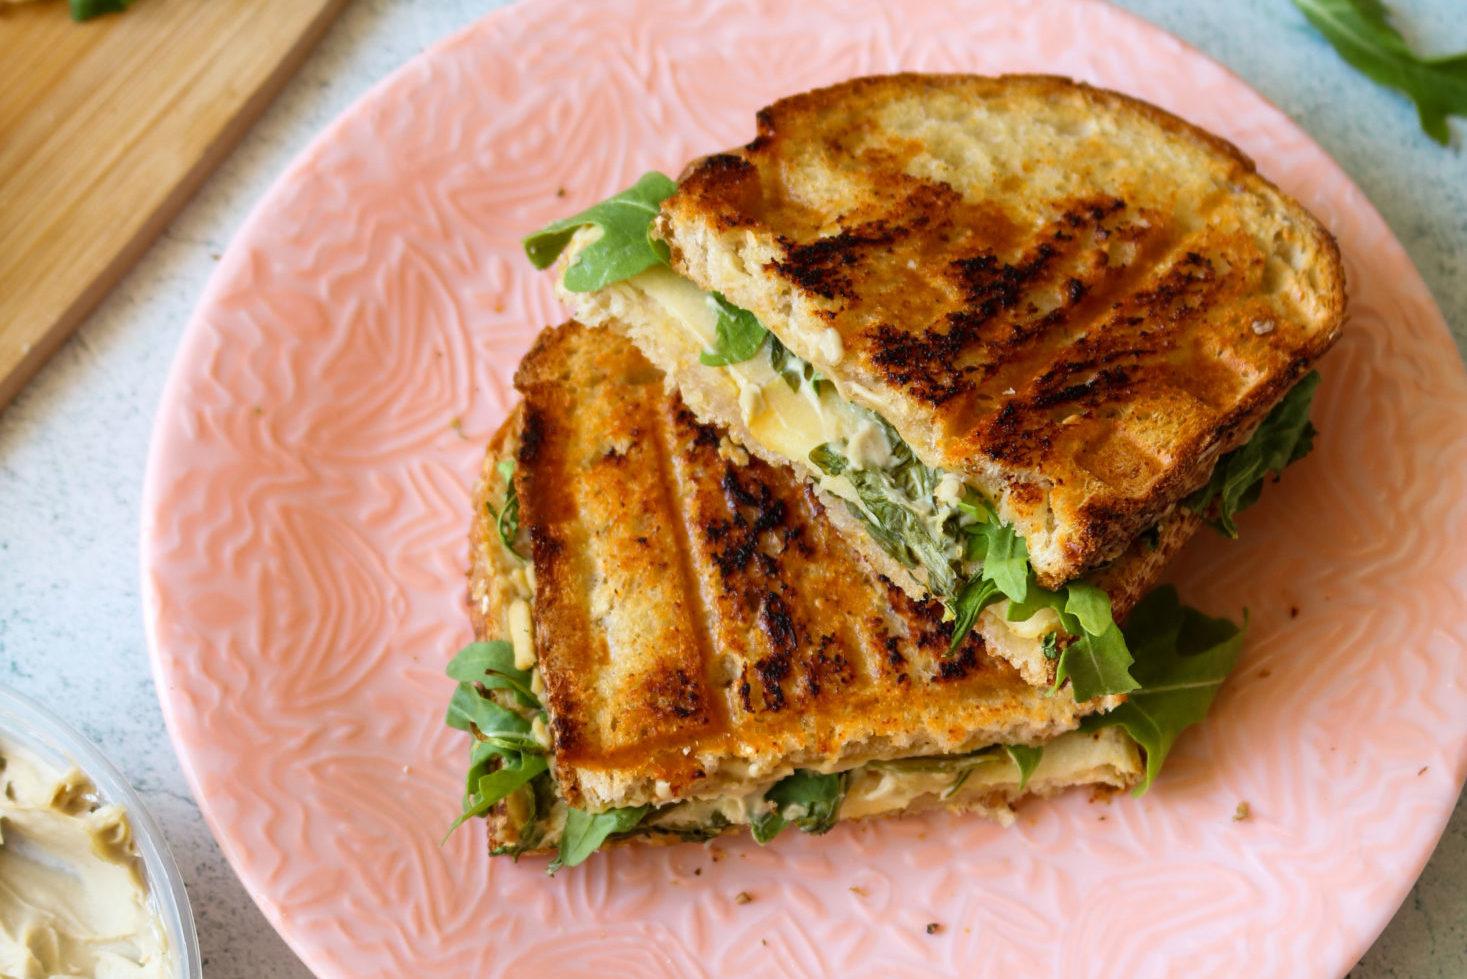 Vegan Panini Recipe with Smoked Gouda, Apple, and Arugula Filling